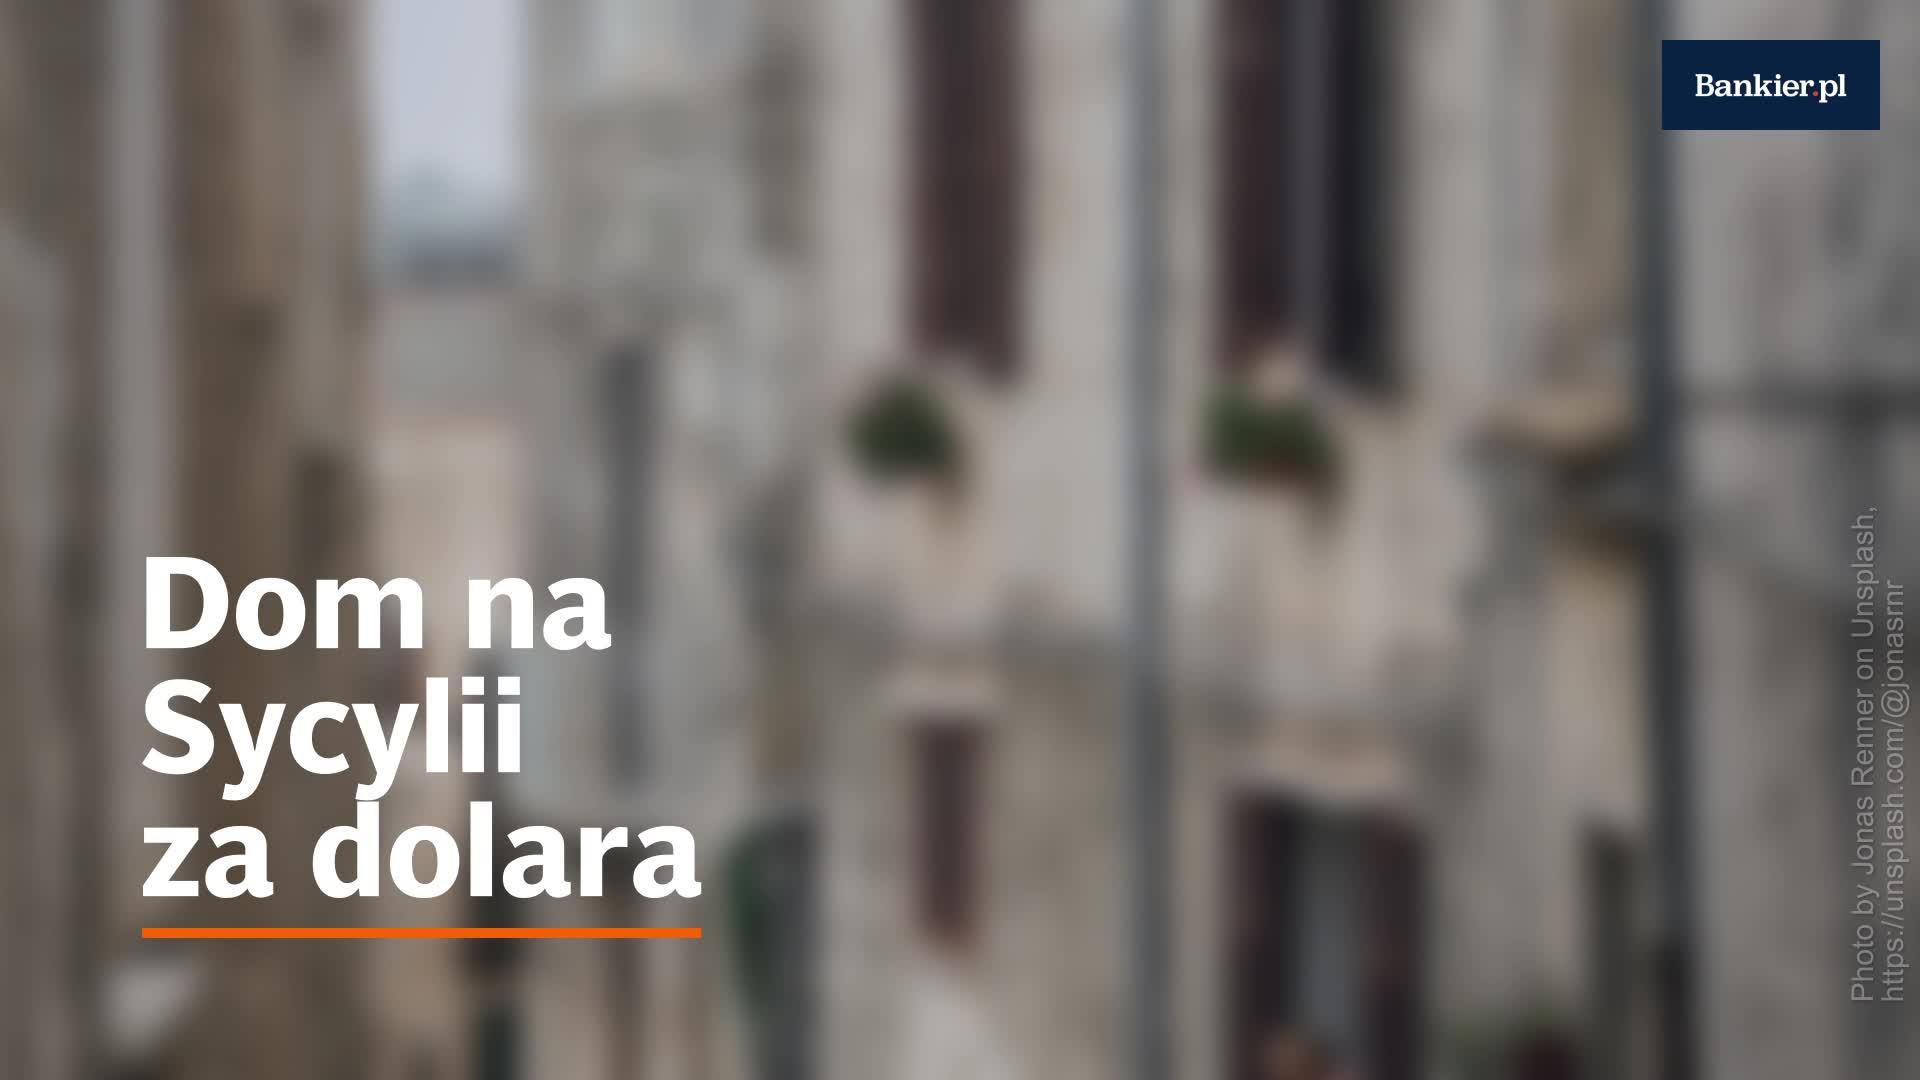 Dom za dolara do kupienia na Sycylii